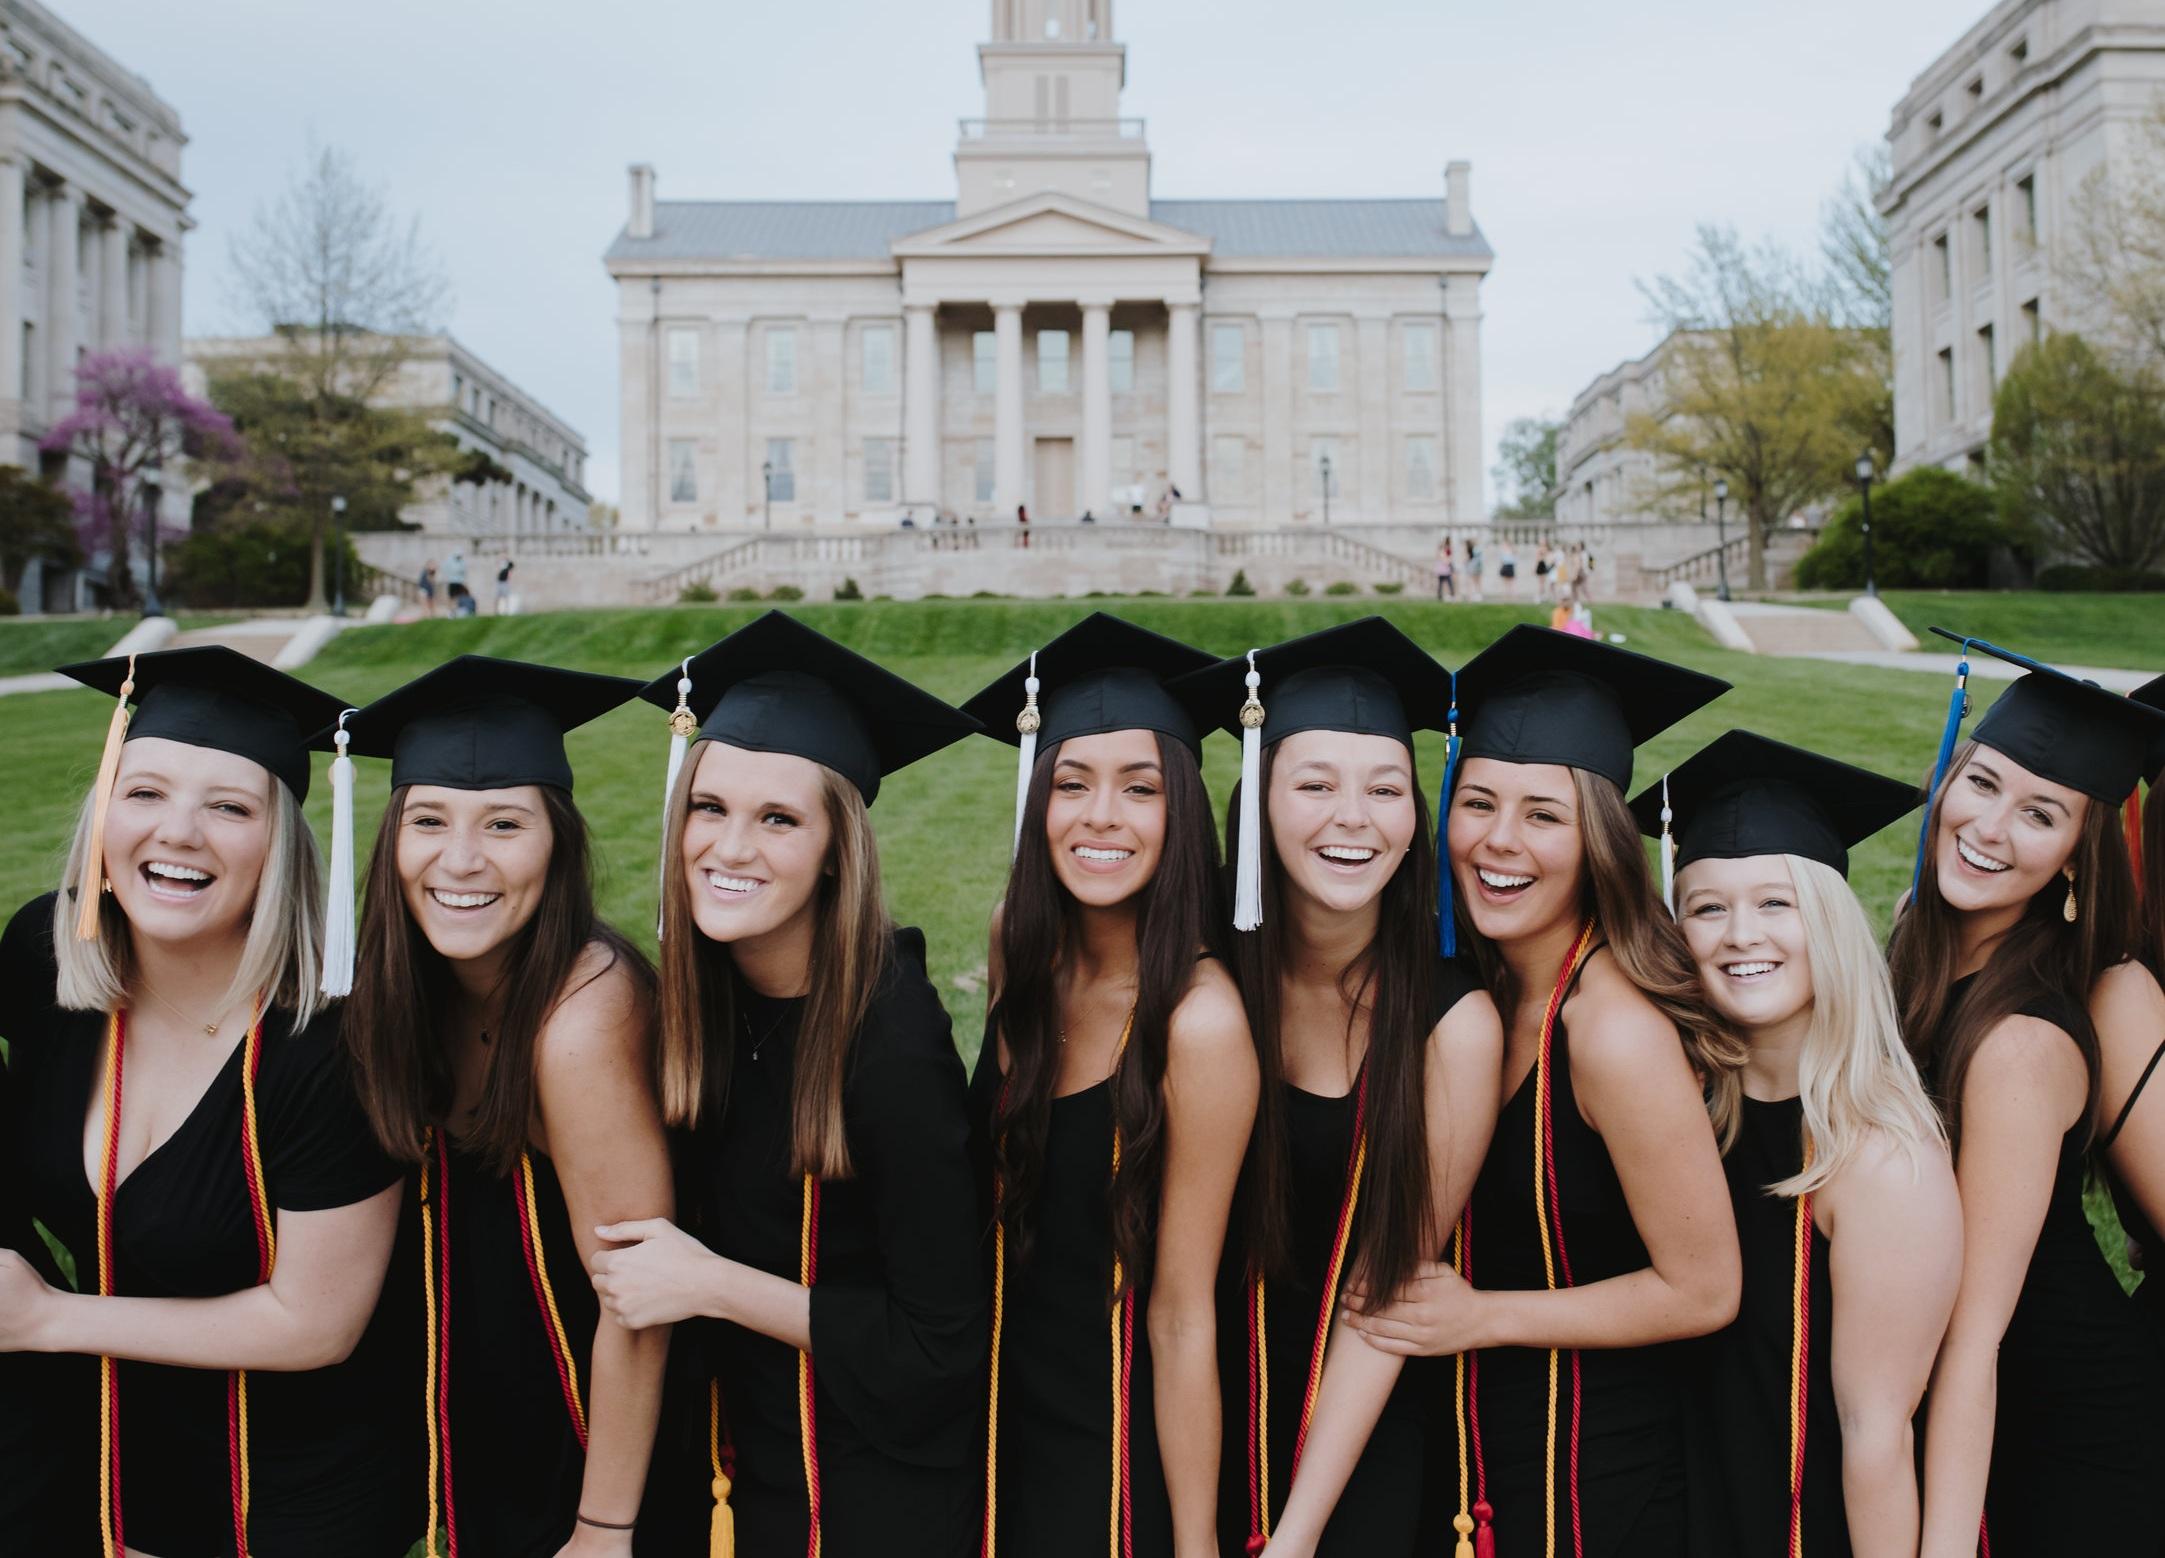 university-of-iowa-graduation-cap-gown.jpg